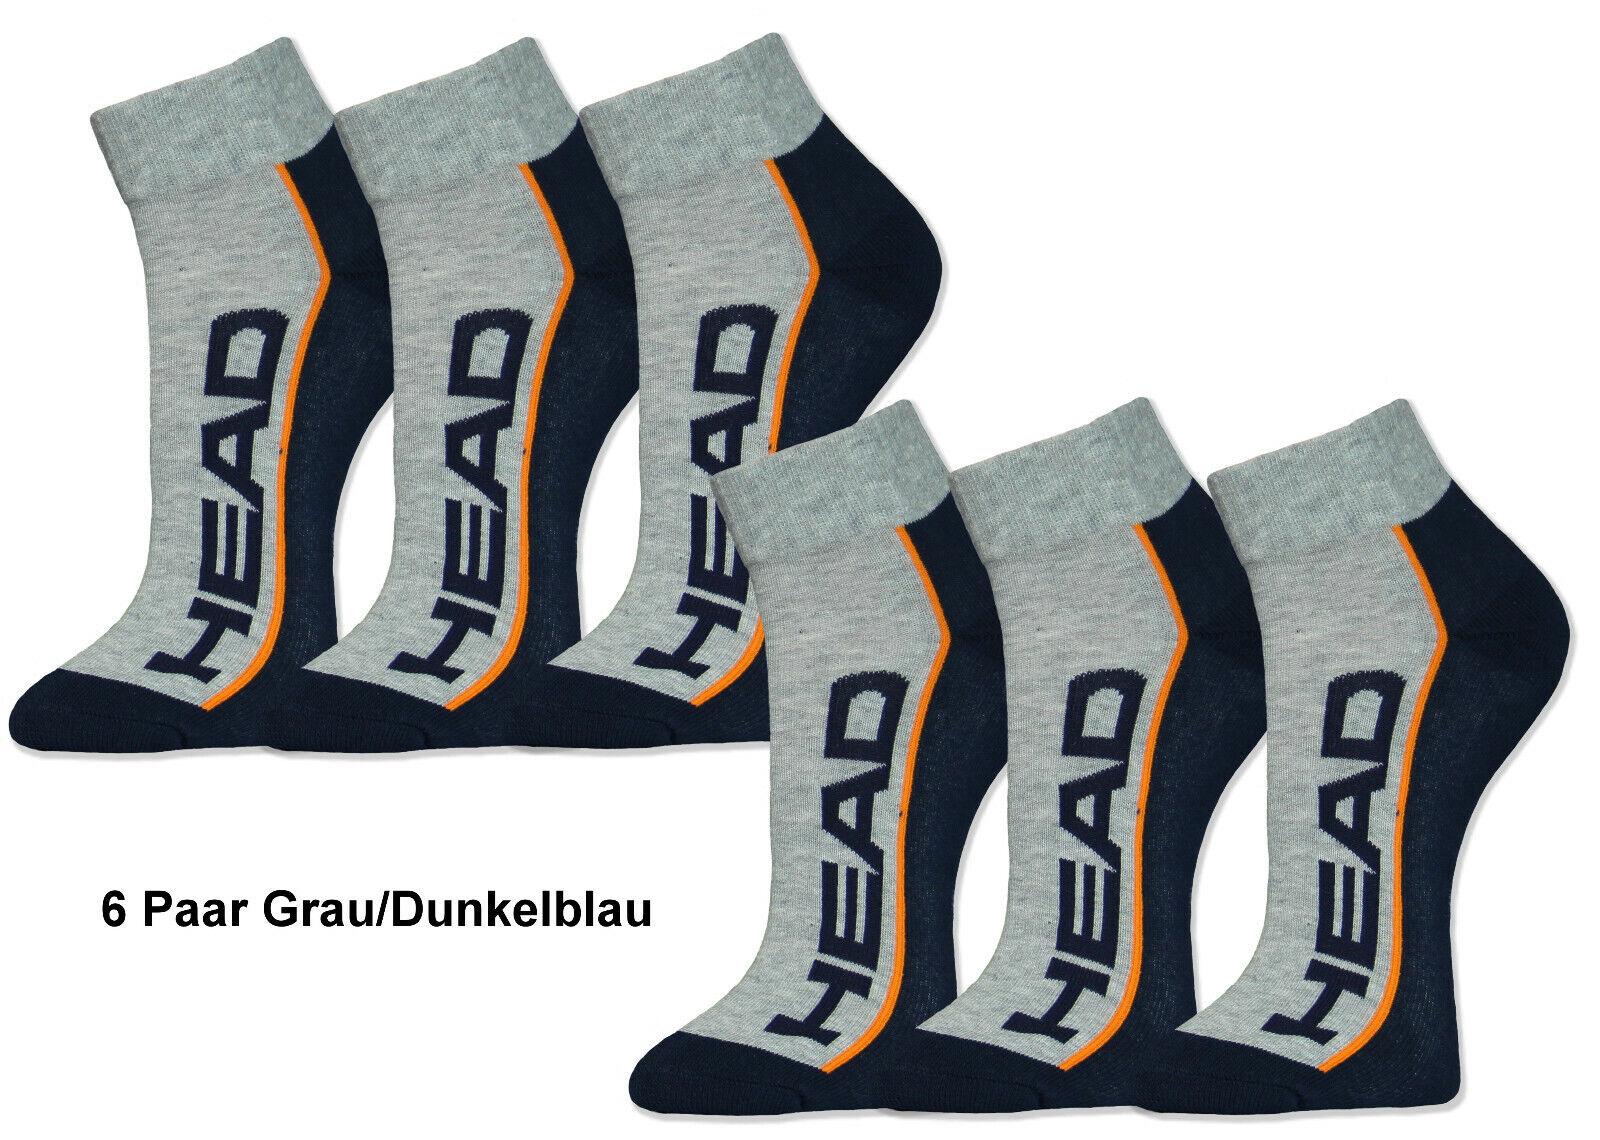 HEAD Sportsocken Quarter Kurzschaft Socken 6 / 12 / 18 / 24 Paar Frotteesohle